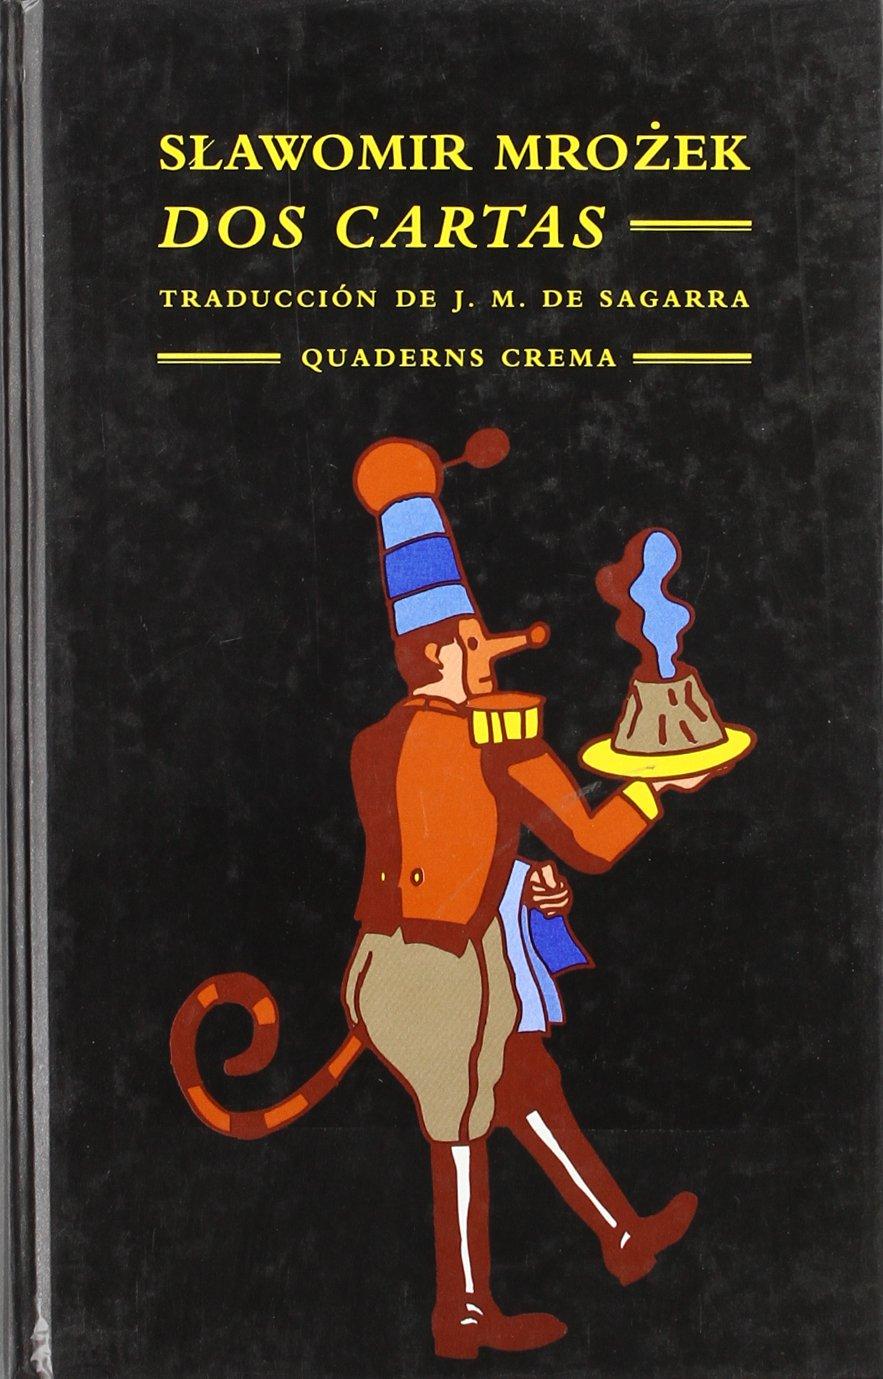 Dos cartas: Amazon.es: Slawomir Mrozek: Libros